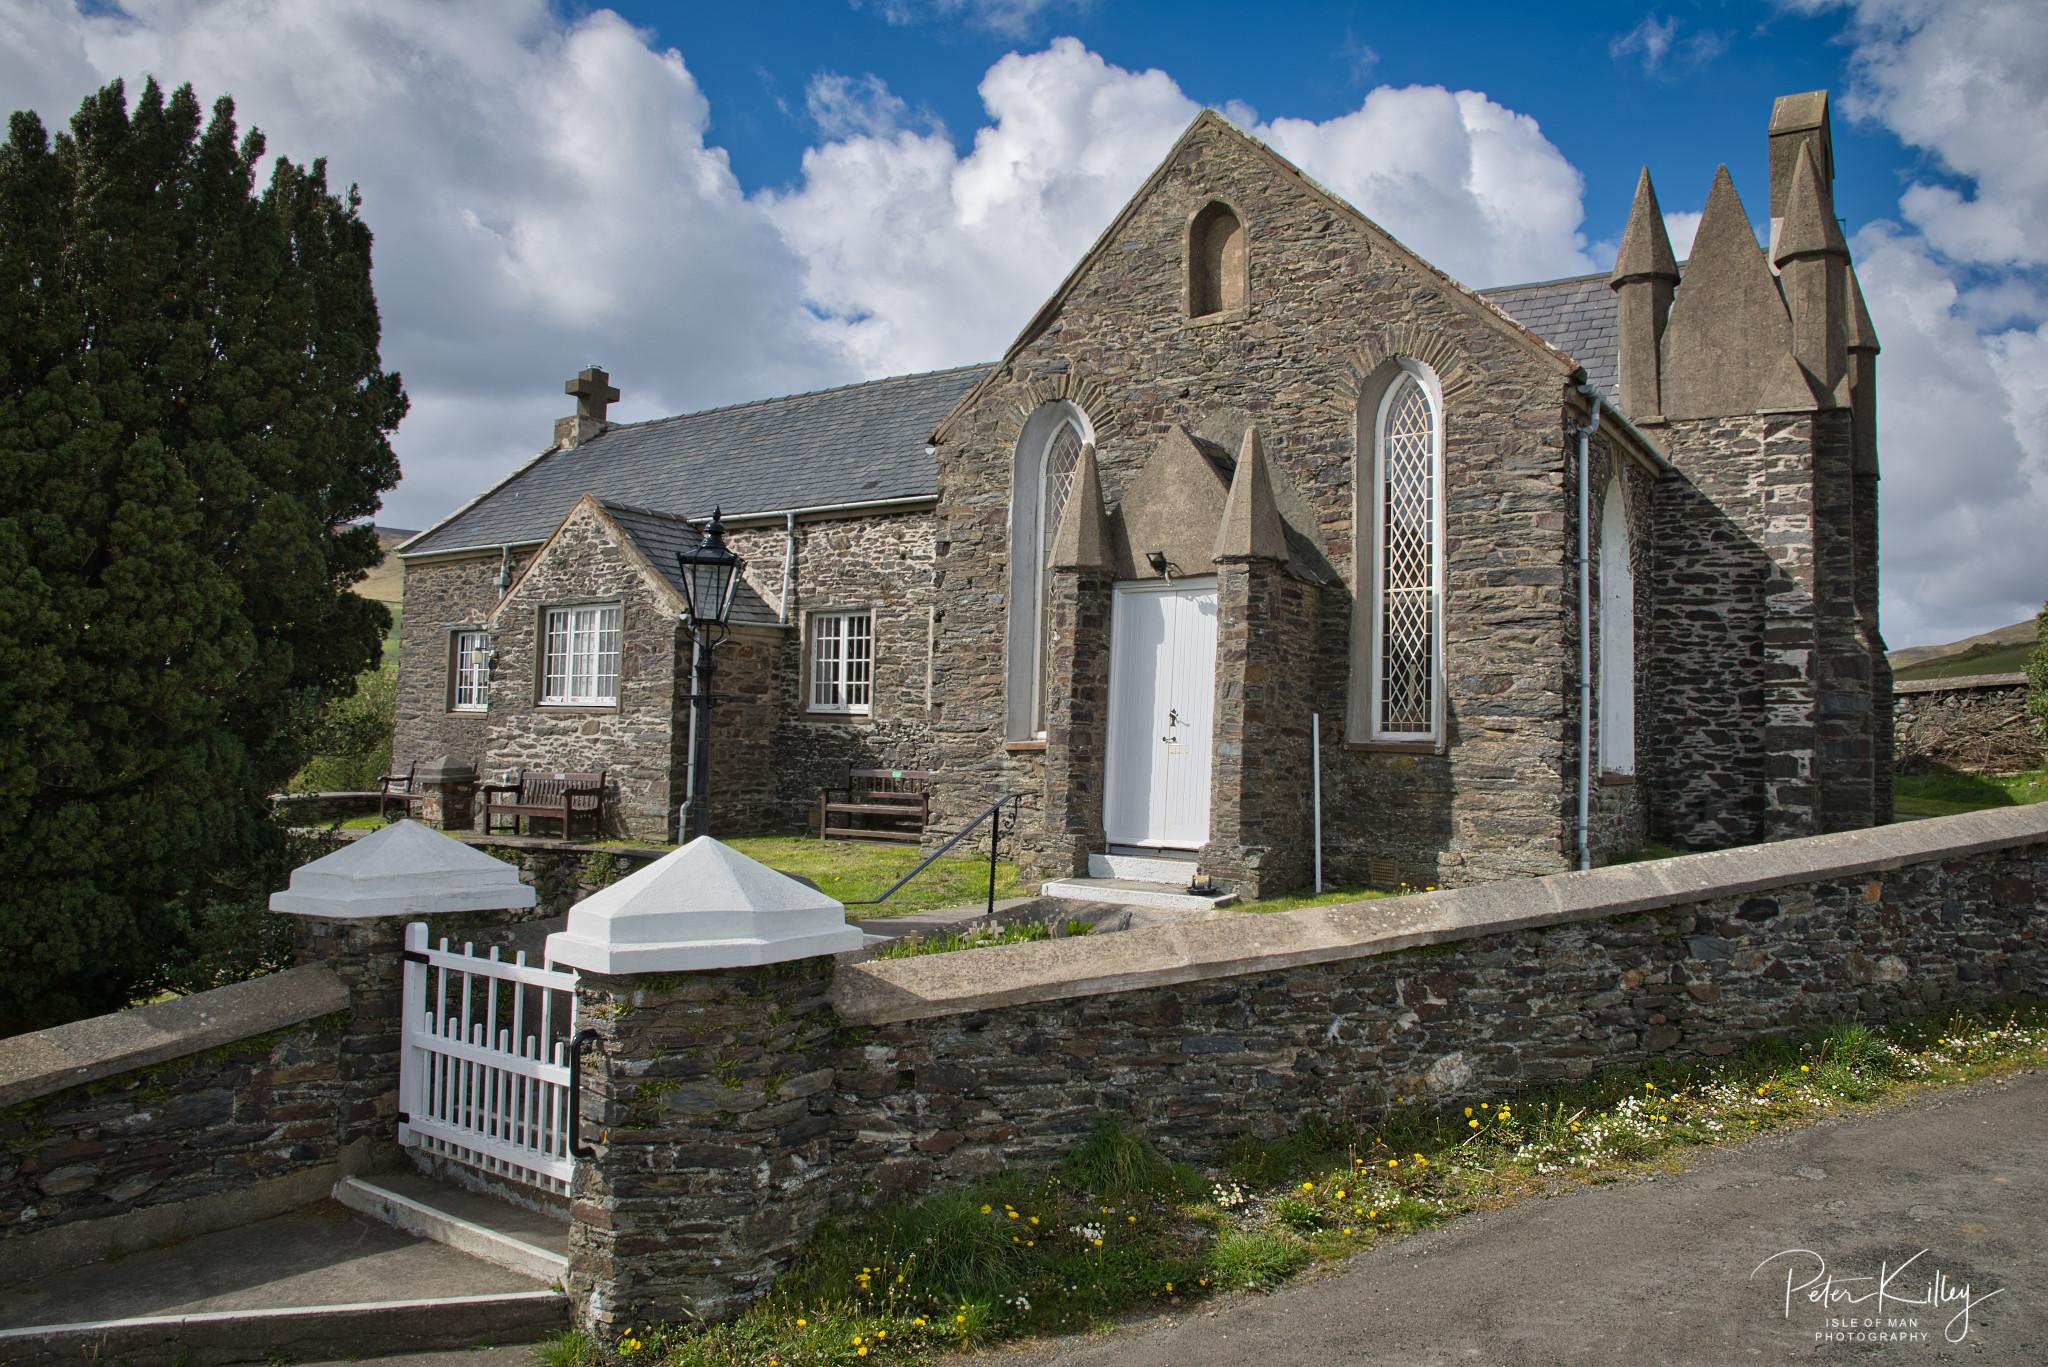 St Lukes, Baldwin - © Peter Killey - www.manxscenes.com